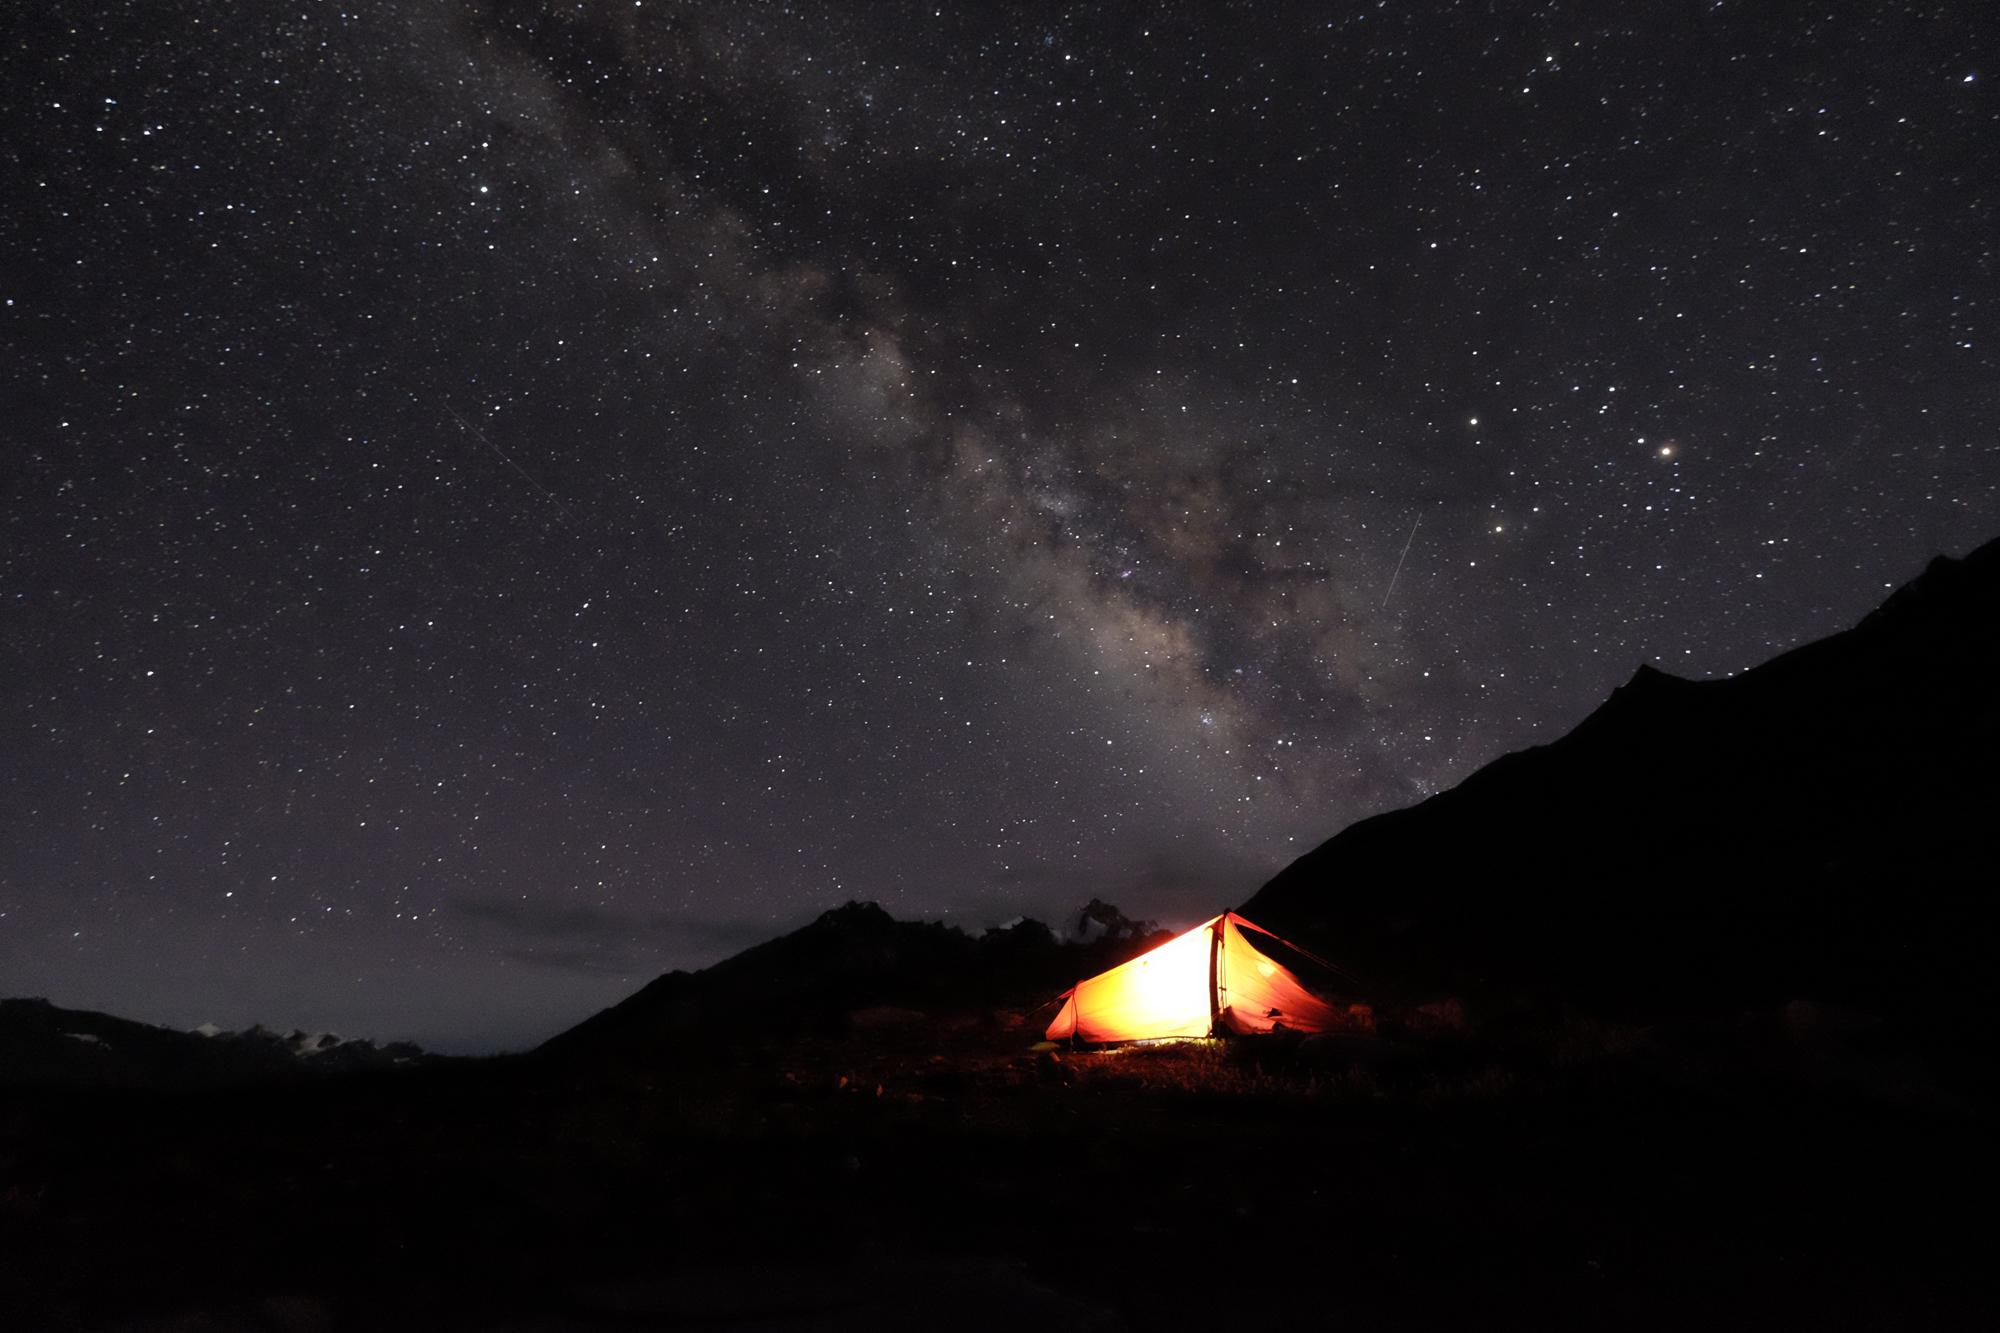 The night sky, Himalaya 2016 by Hamish, explorer